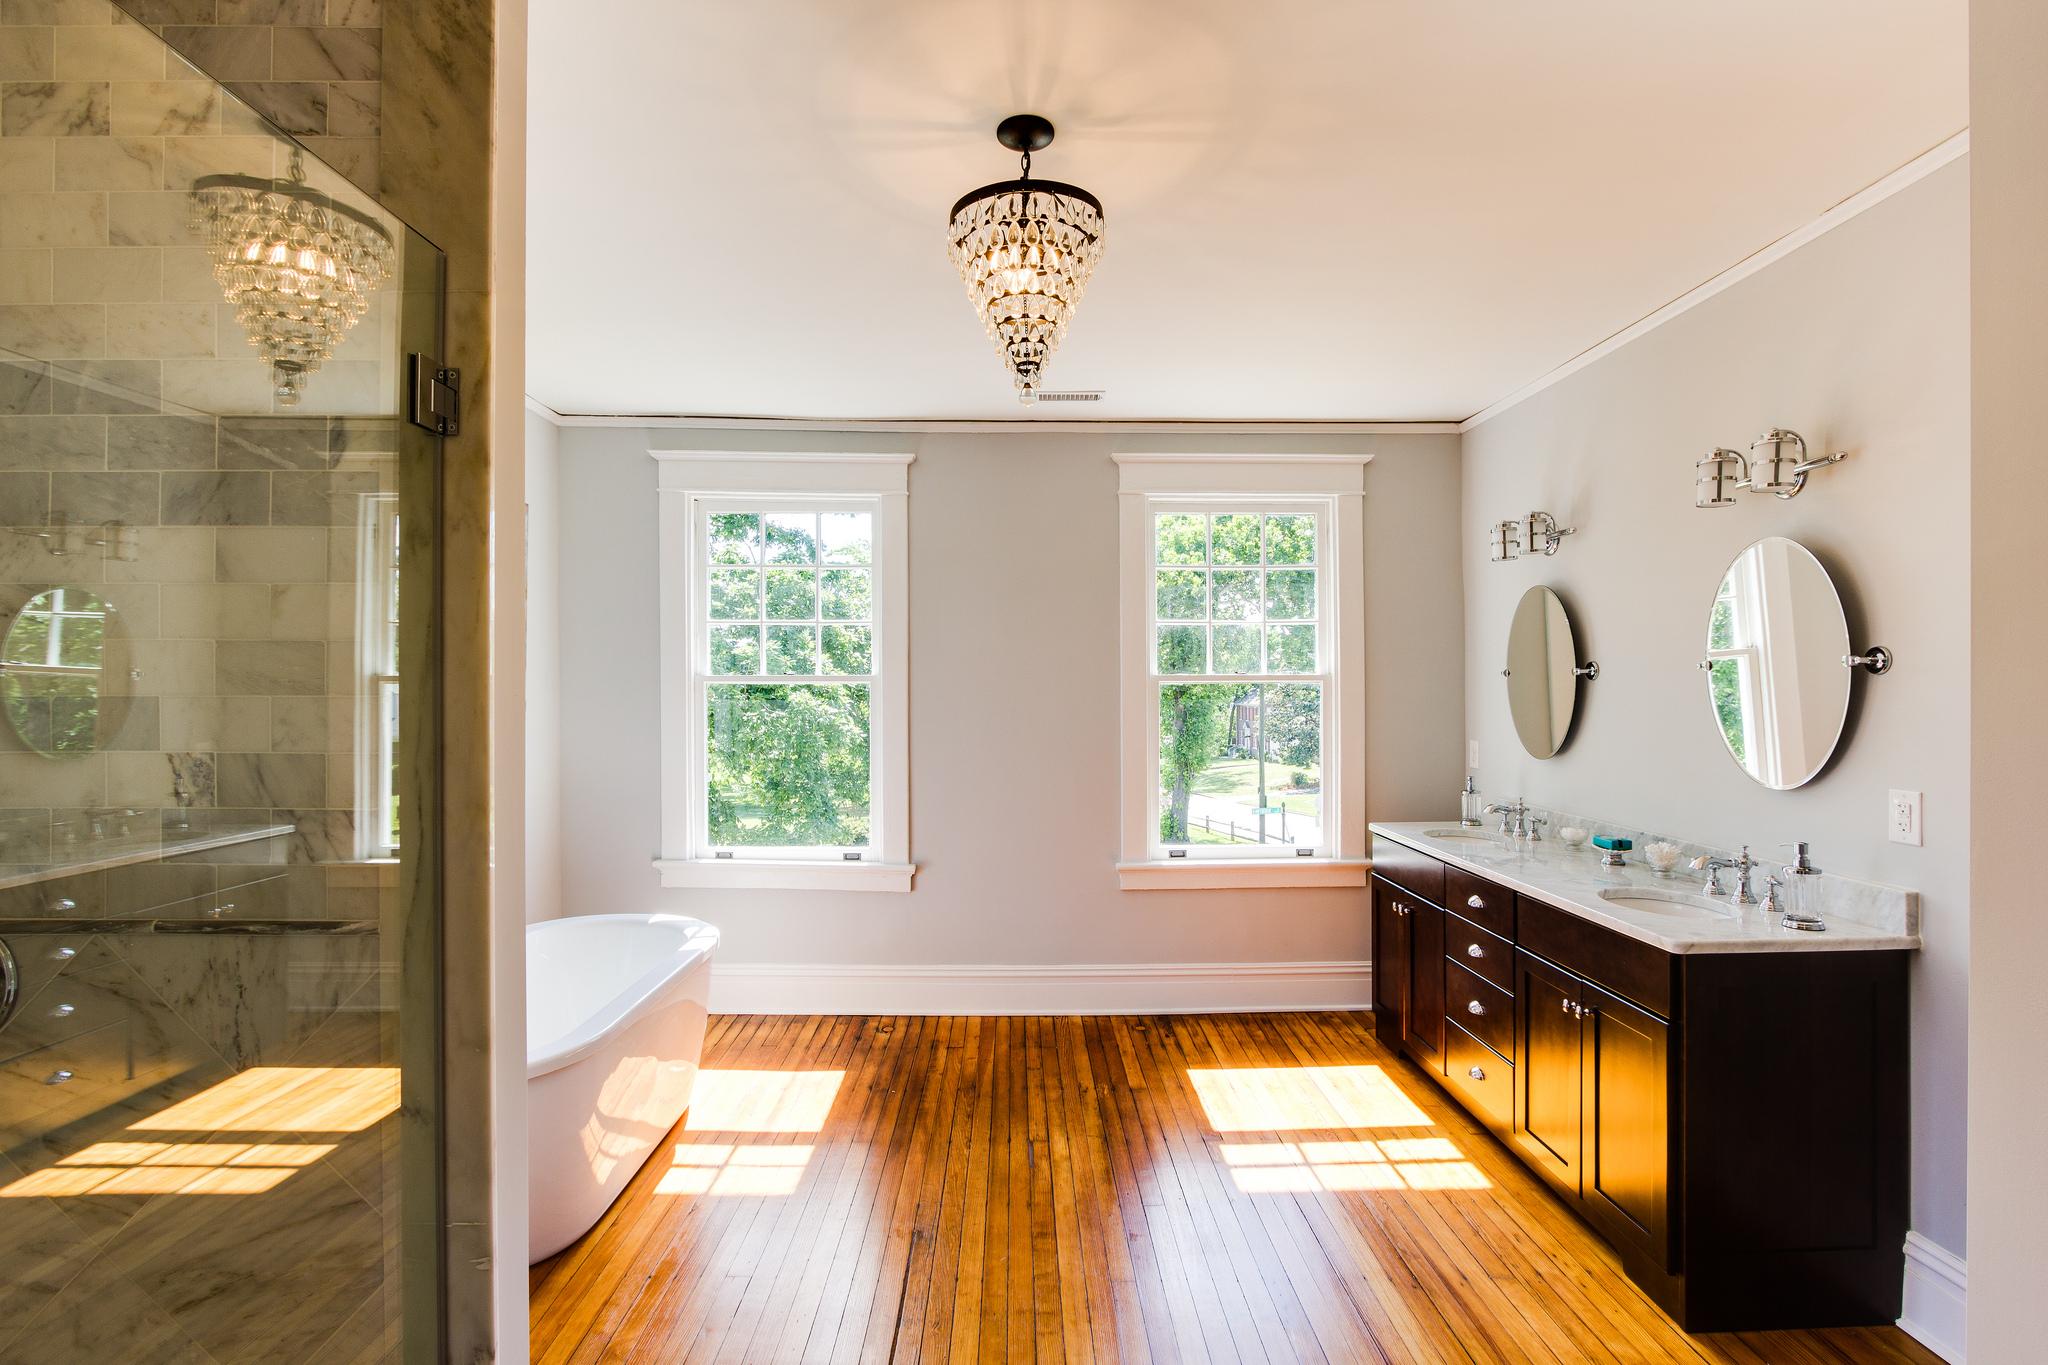 Spacious Bathroom Suite Inspiration From Cobblestone Development Group